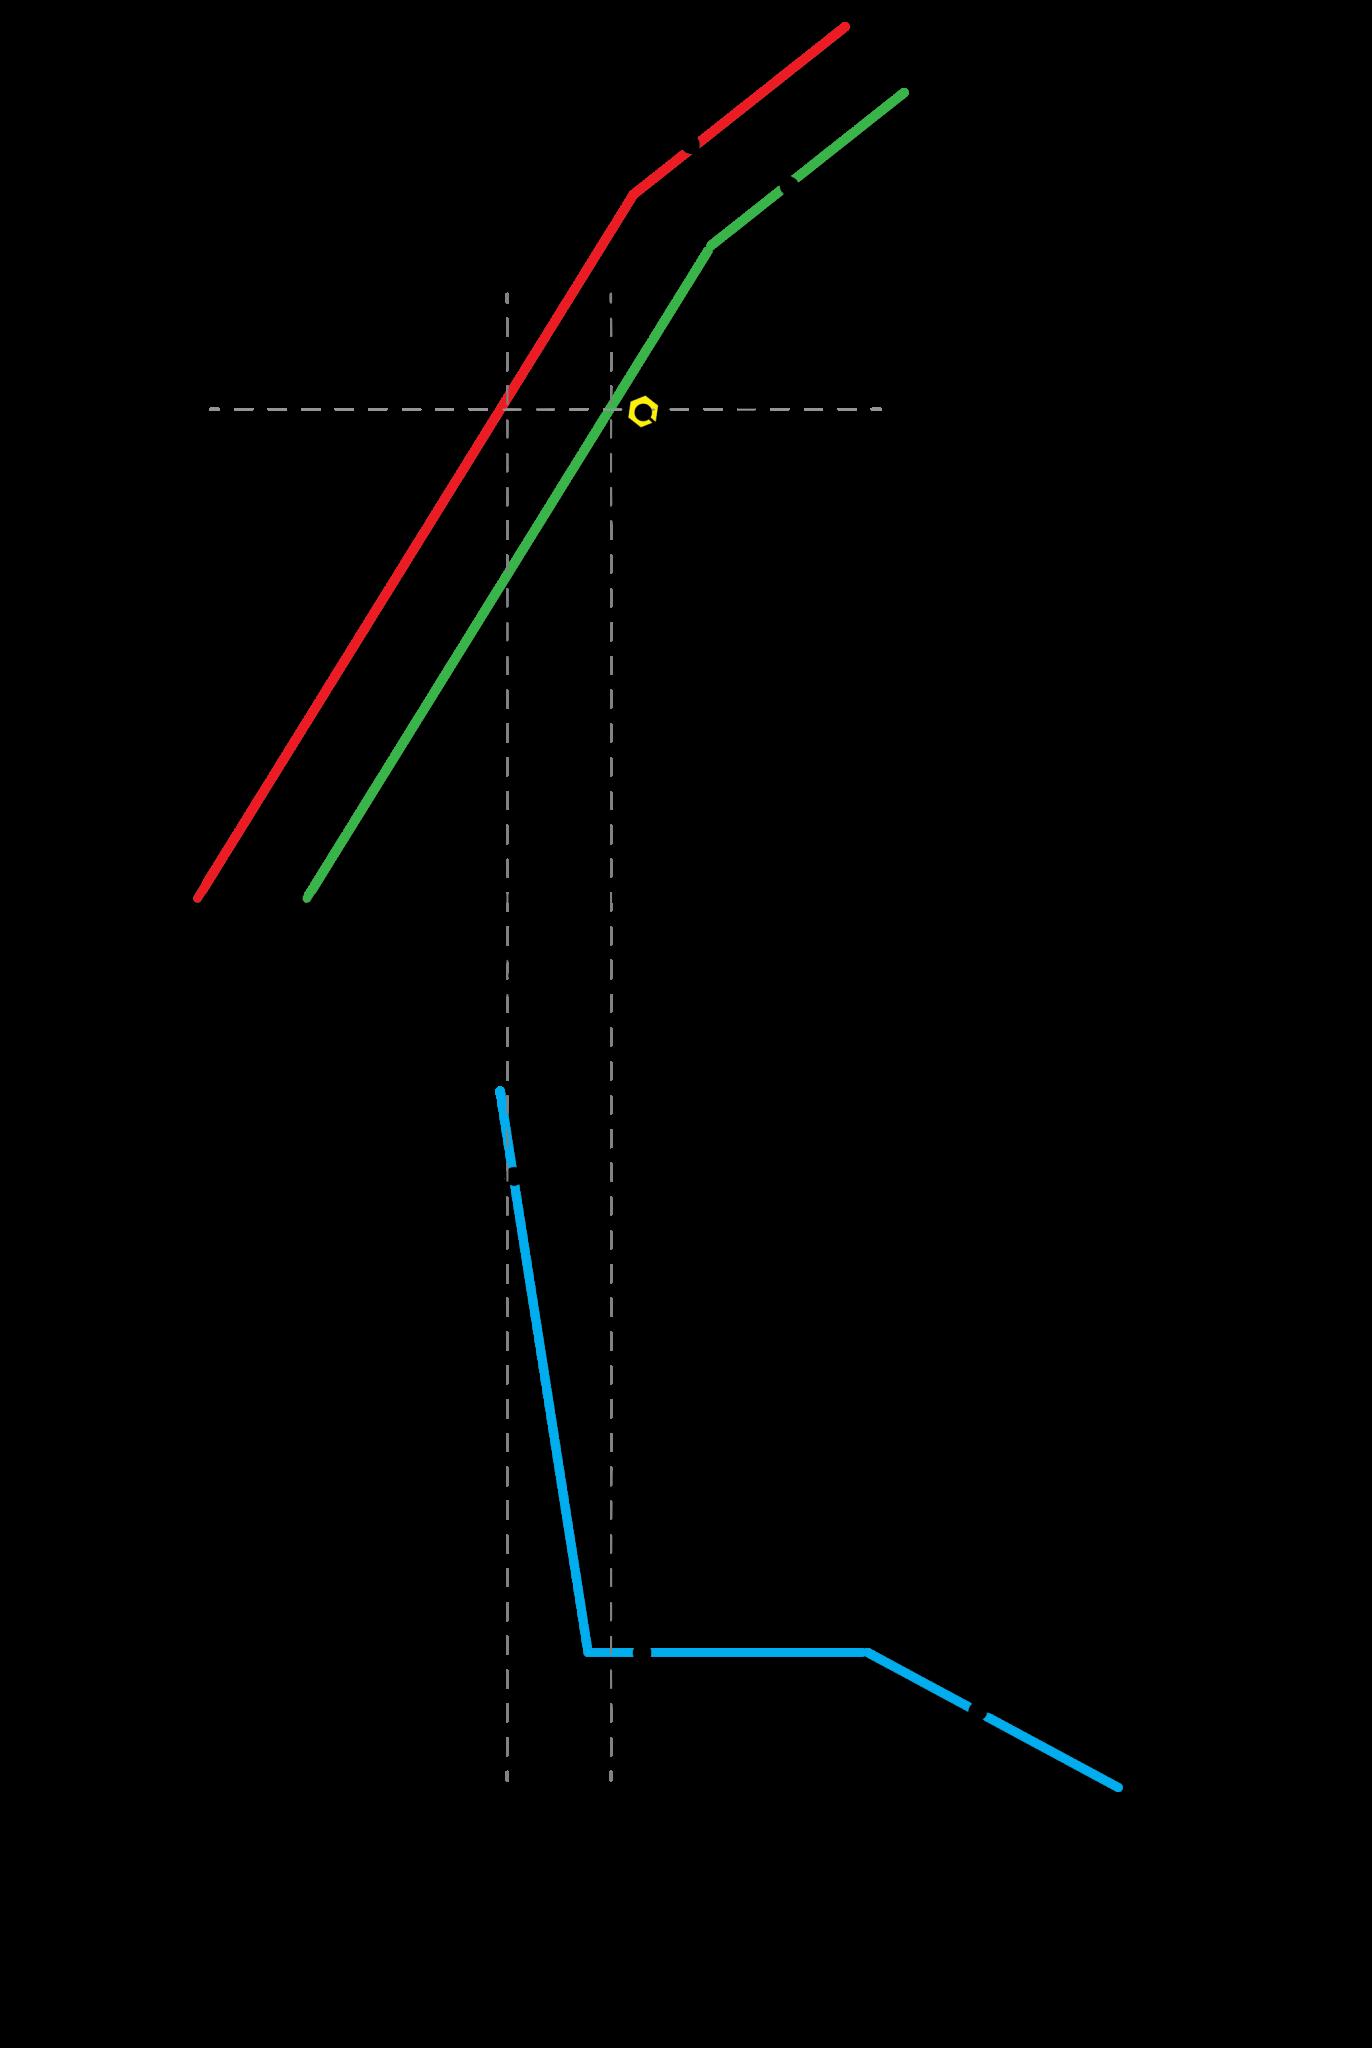 Adaptive tuning